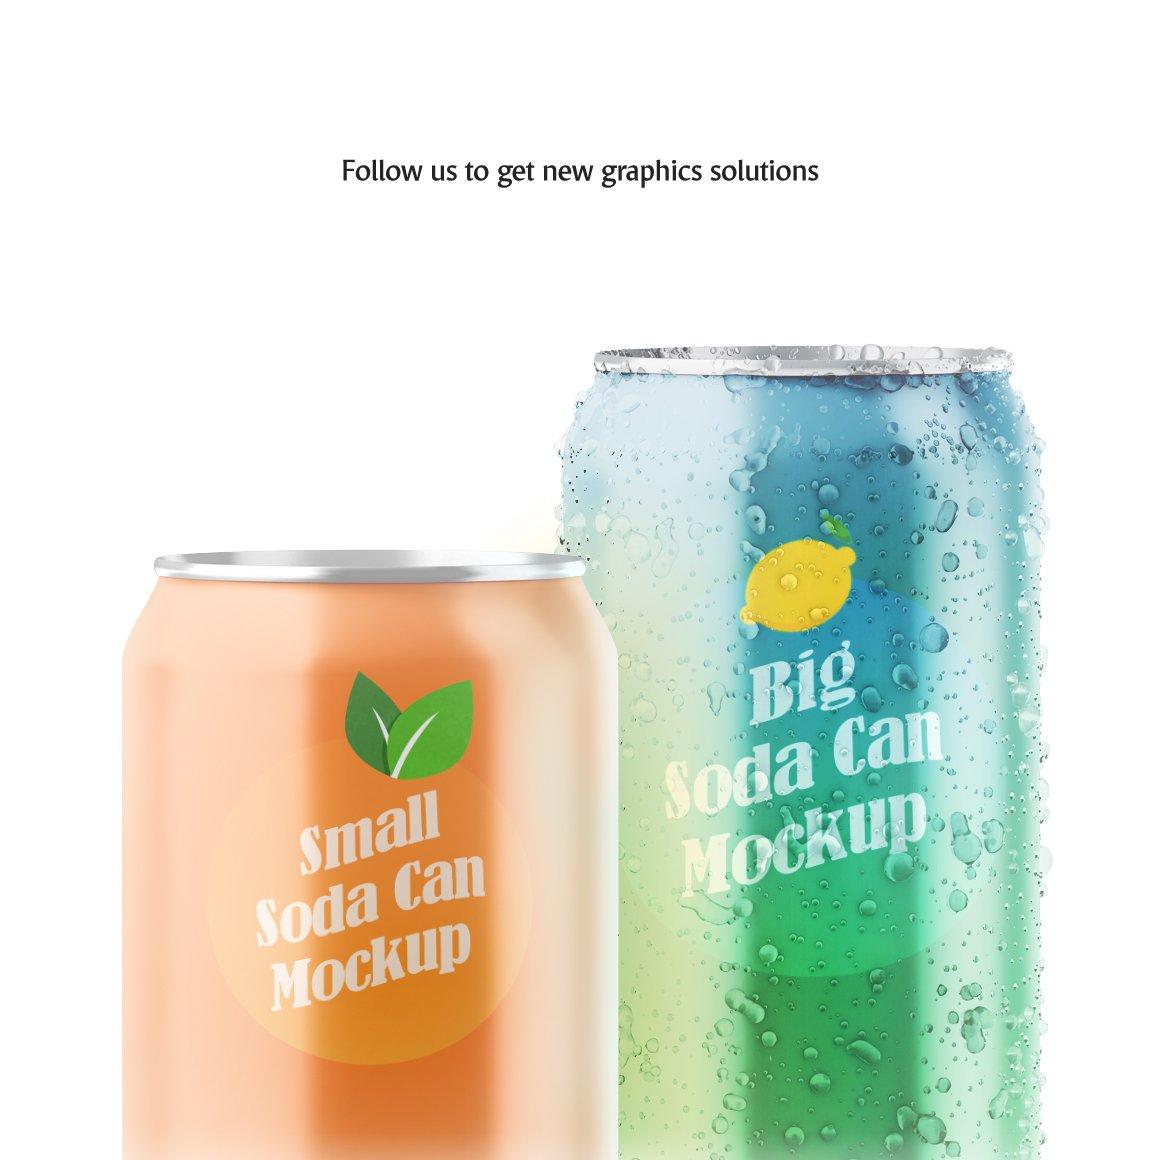 饮料汽水易拉罐锡罐设计动态展示样机 Soda Can Animated Mockup插图(6)